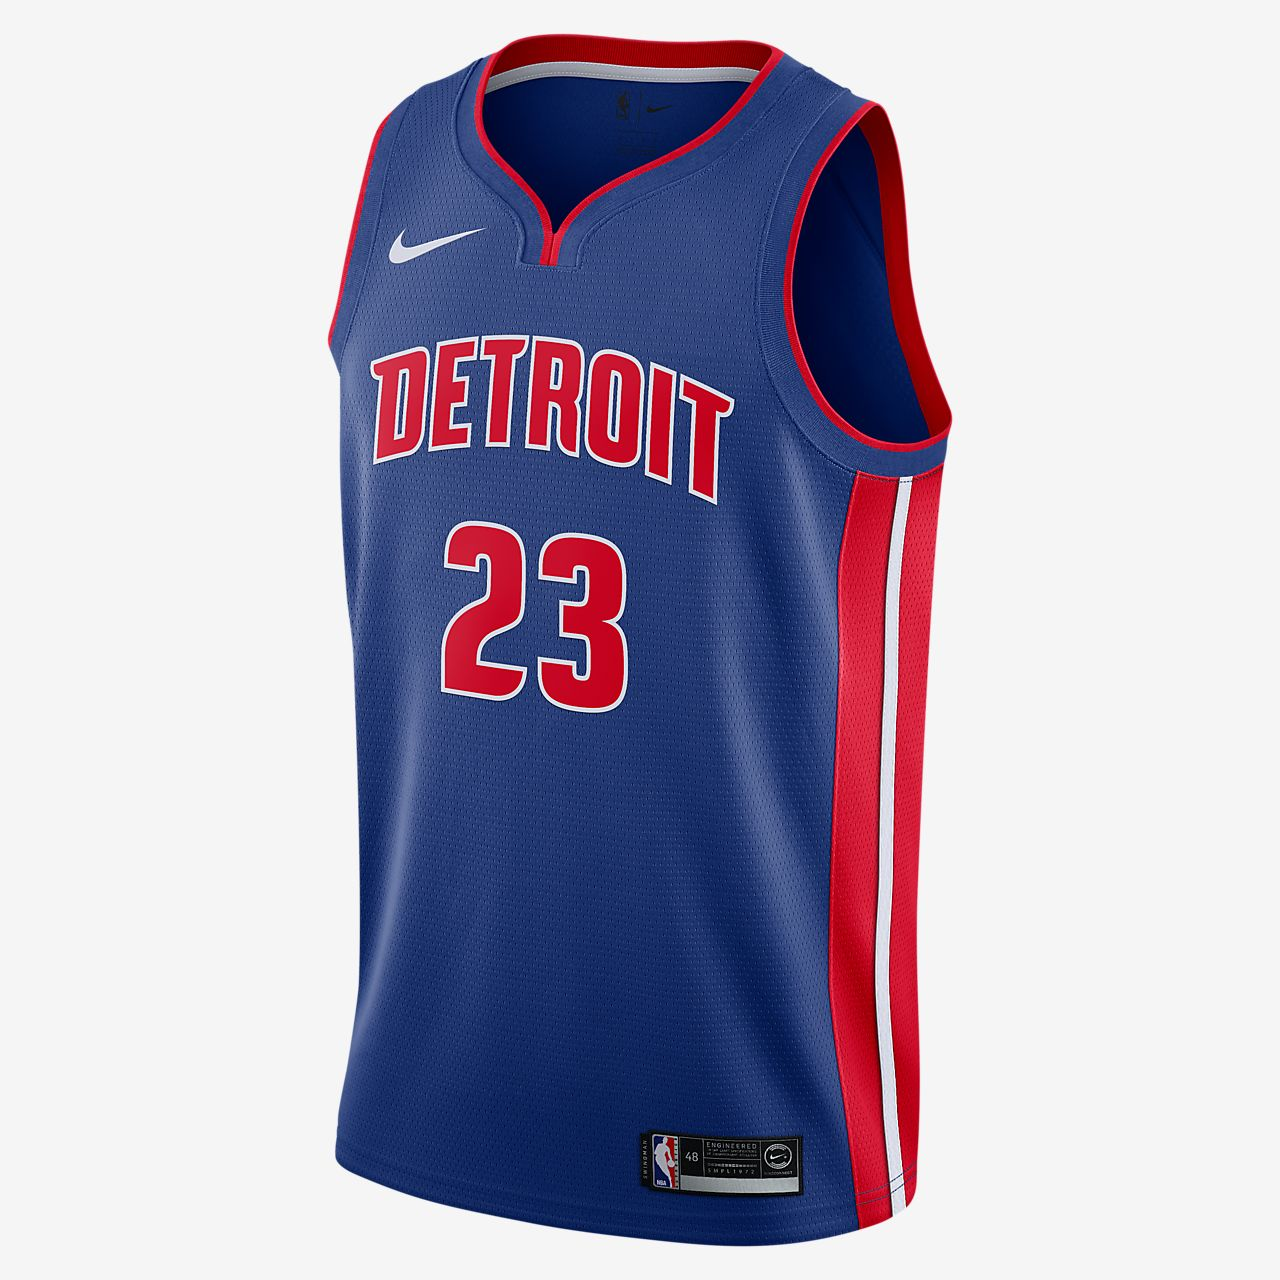 Camisola NBA da Nike Swingman Blake Griffin Pistons Icon Edition